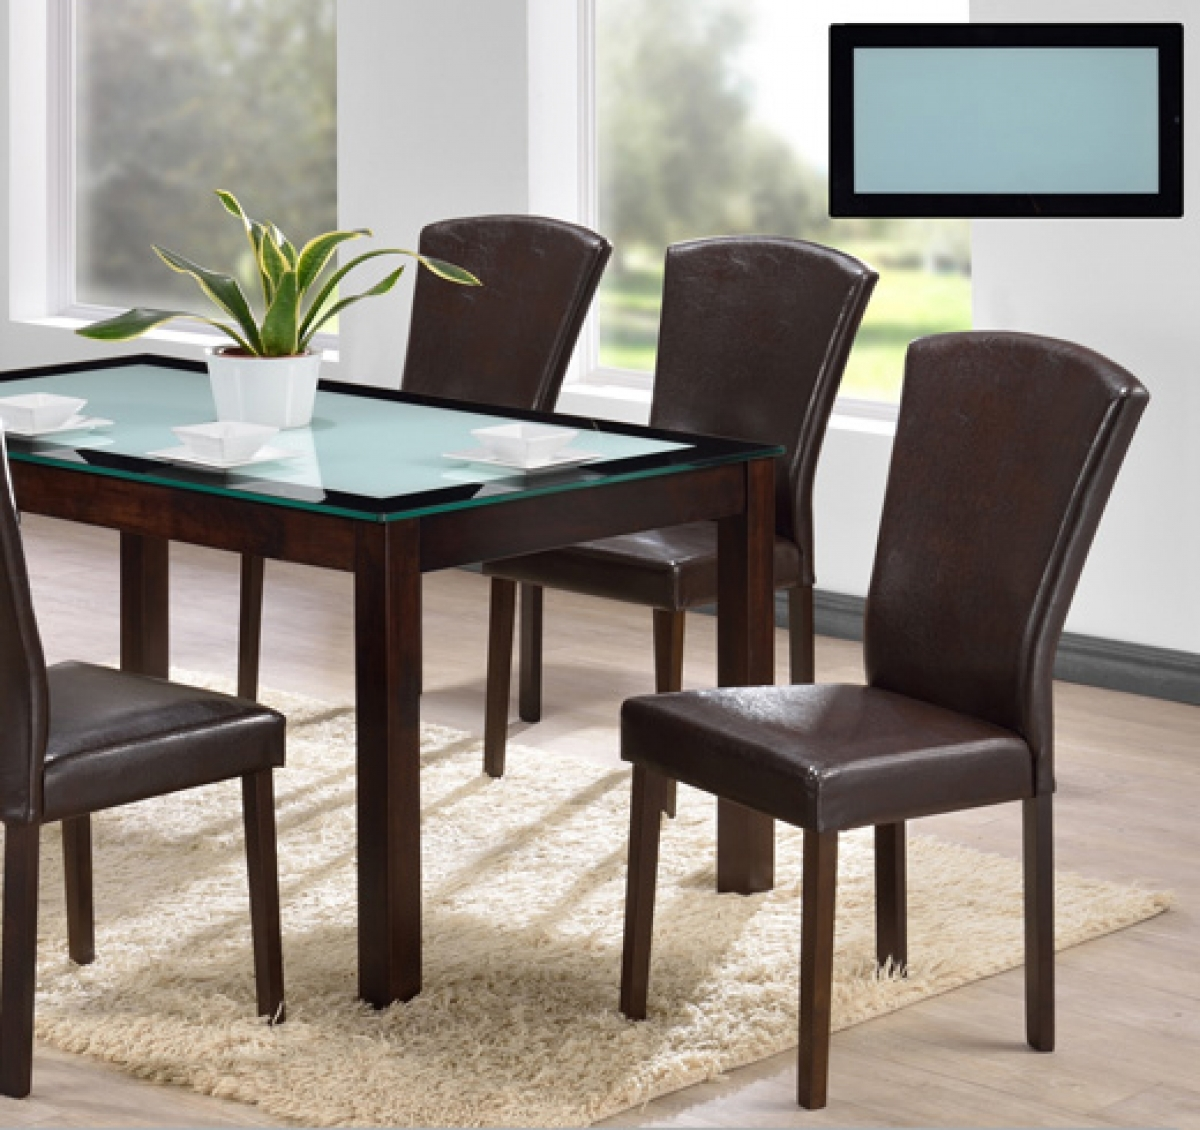 DC P2 GTA 7pc Dining Set RYM Furniture